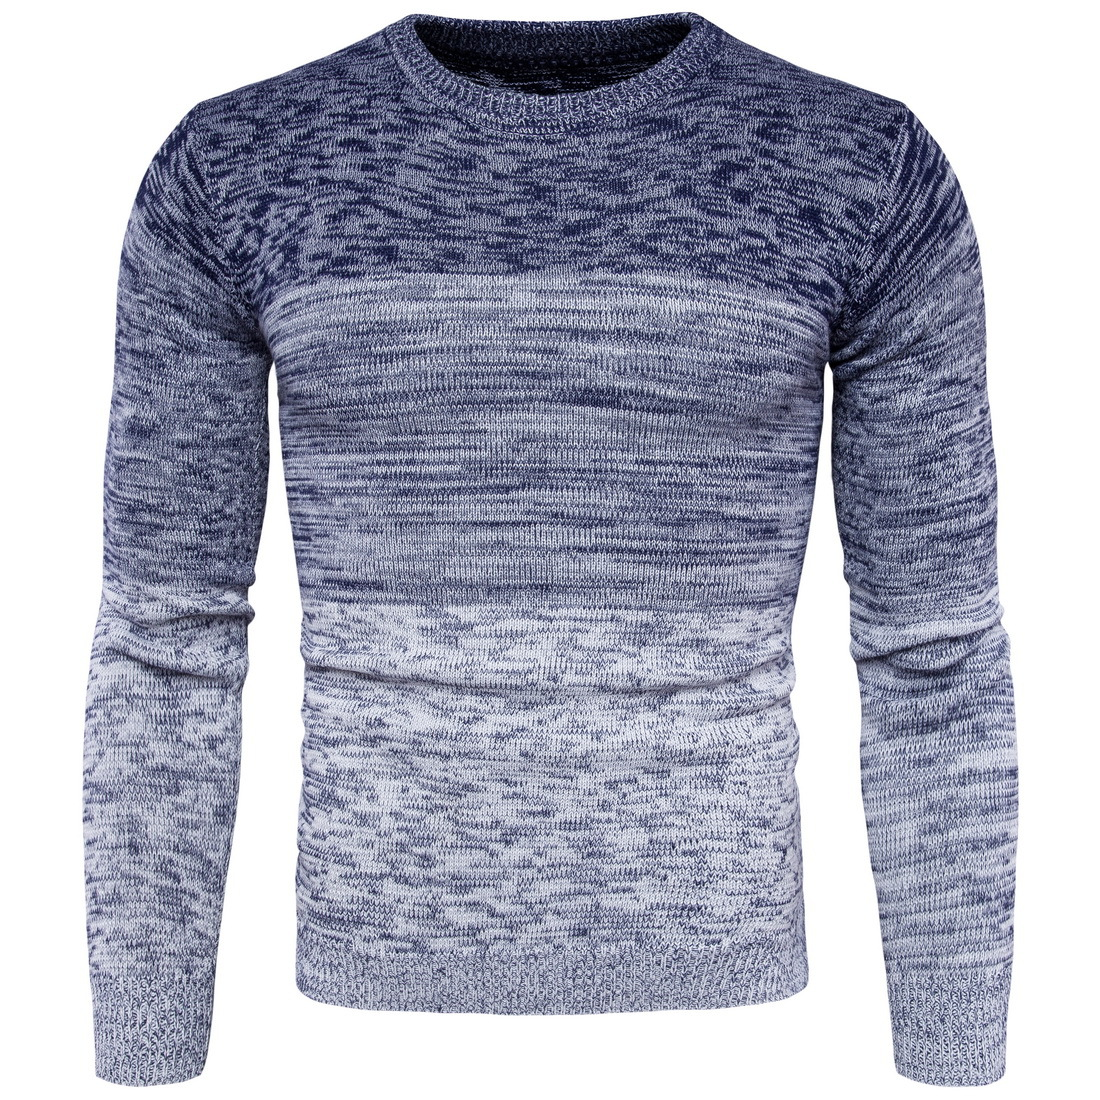 Camisola masculina 2019 nova camisola de tricô